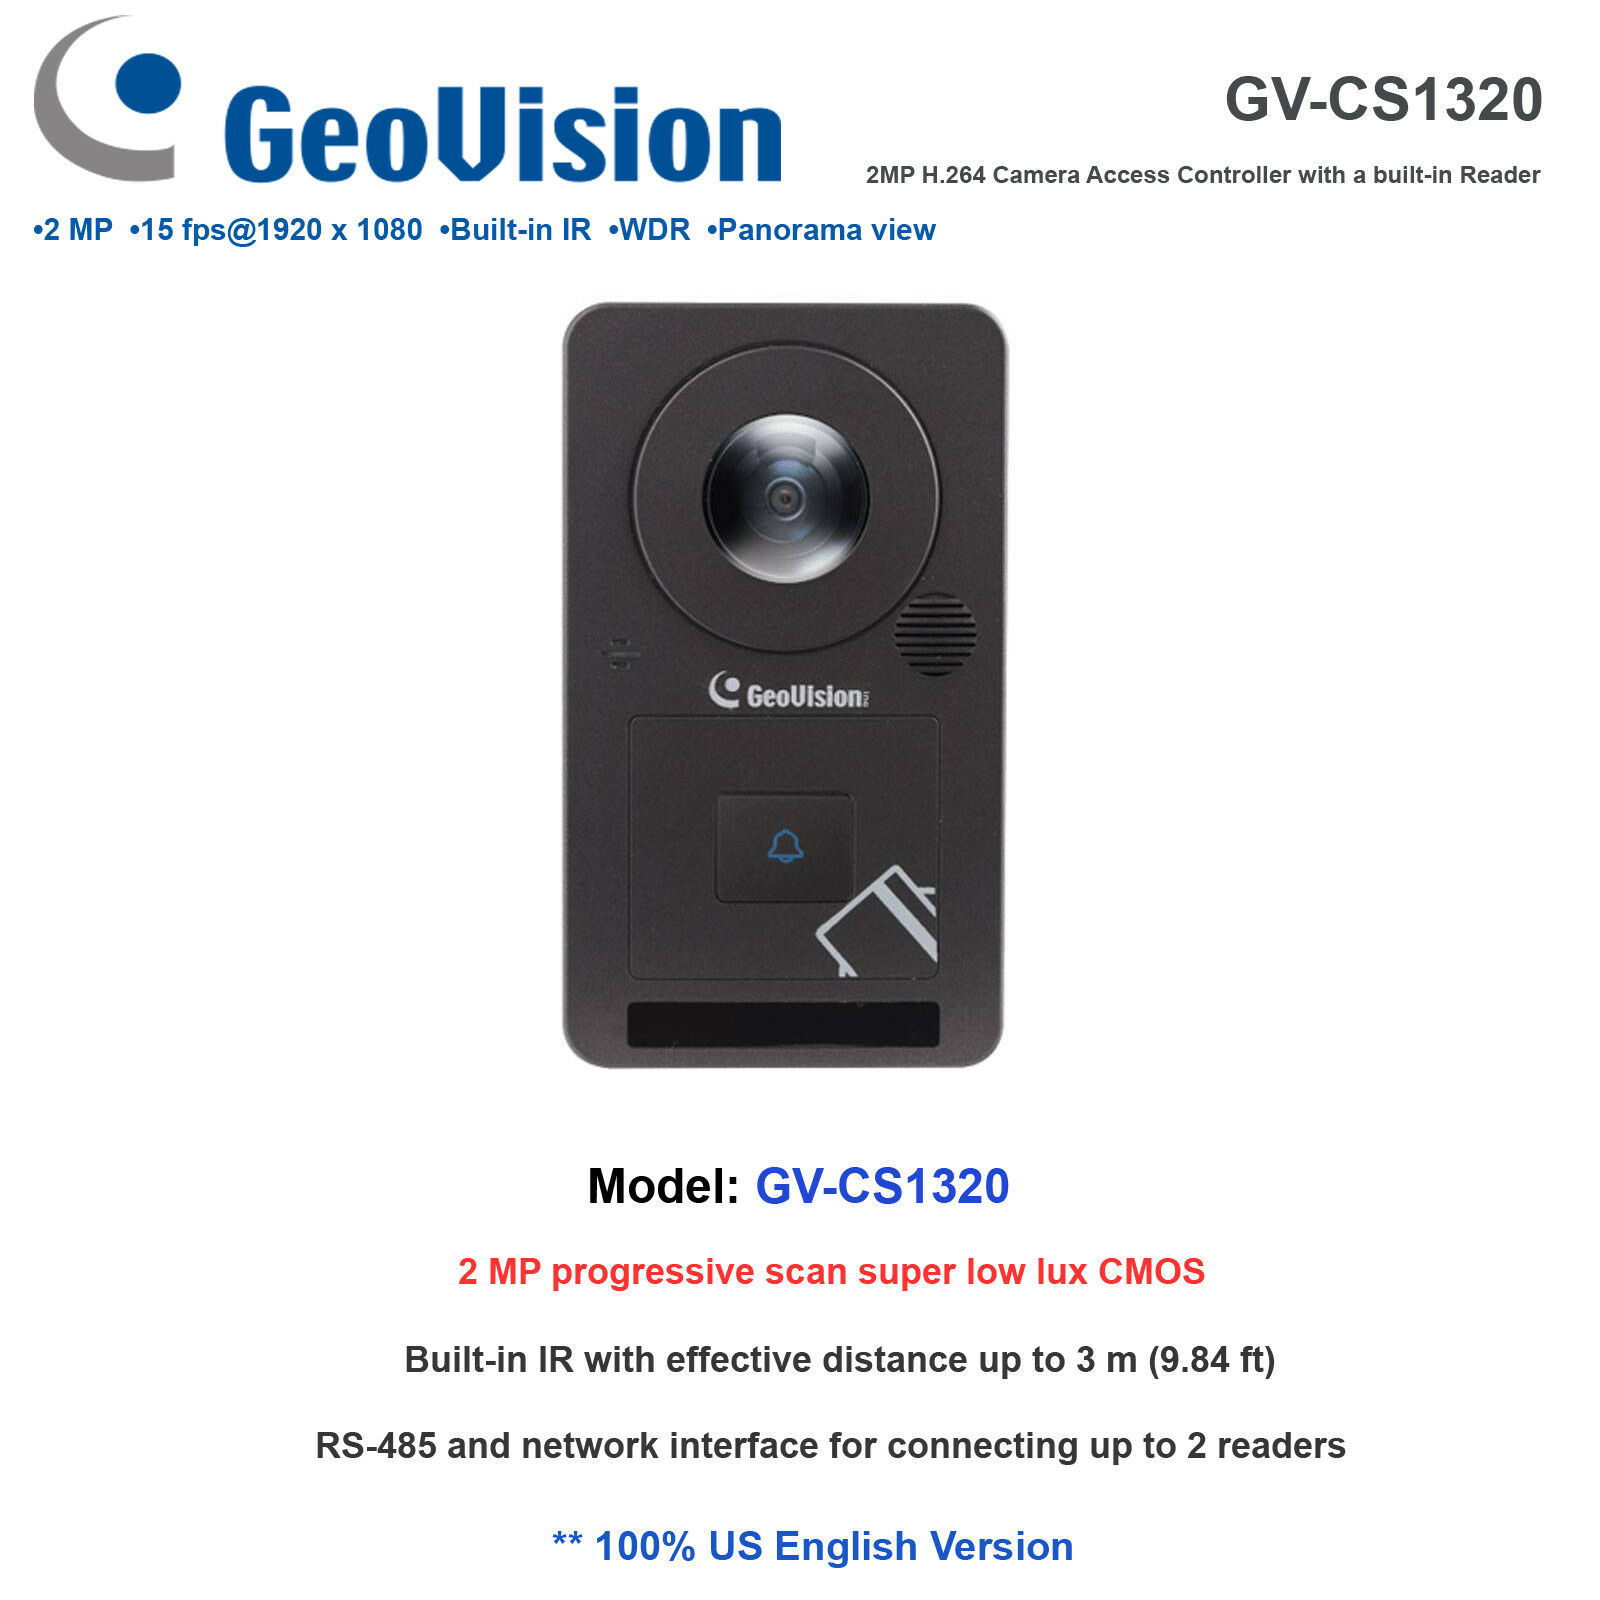 Geovision GV-CS1320 2MP H.265 1080P 180˚ Panoramic IP Camera Reader Controller